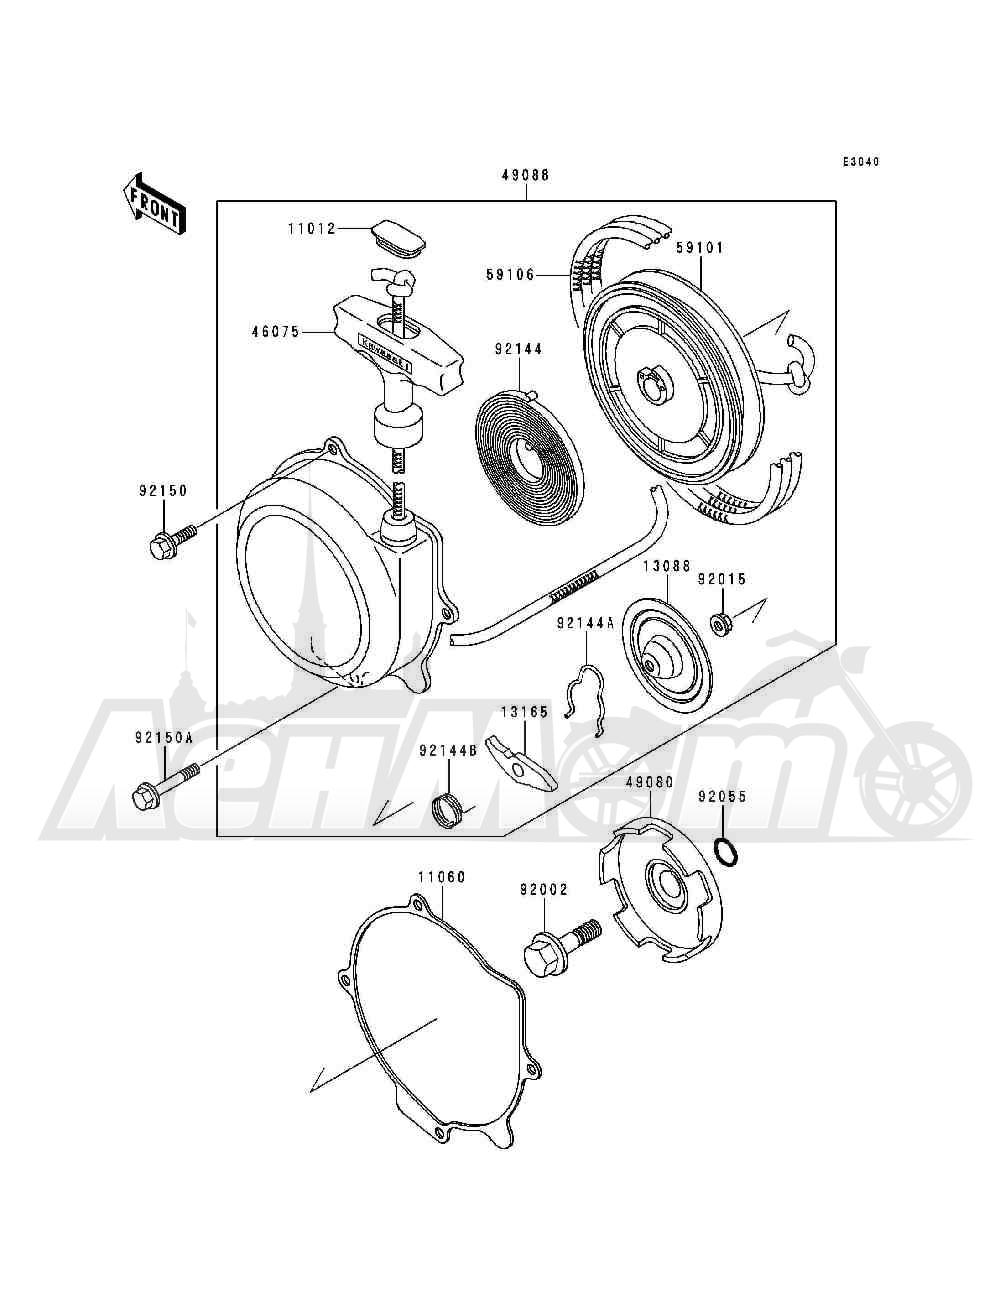 Запчасти для Квадроцикла Kawasaki 1993 BAYOU 300 (KLF300-B6) Раздел: RECOIL STARTER | ручной стартер